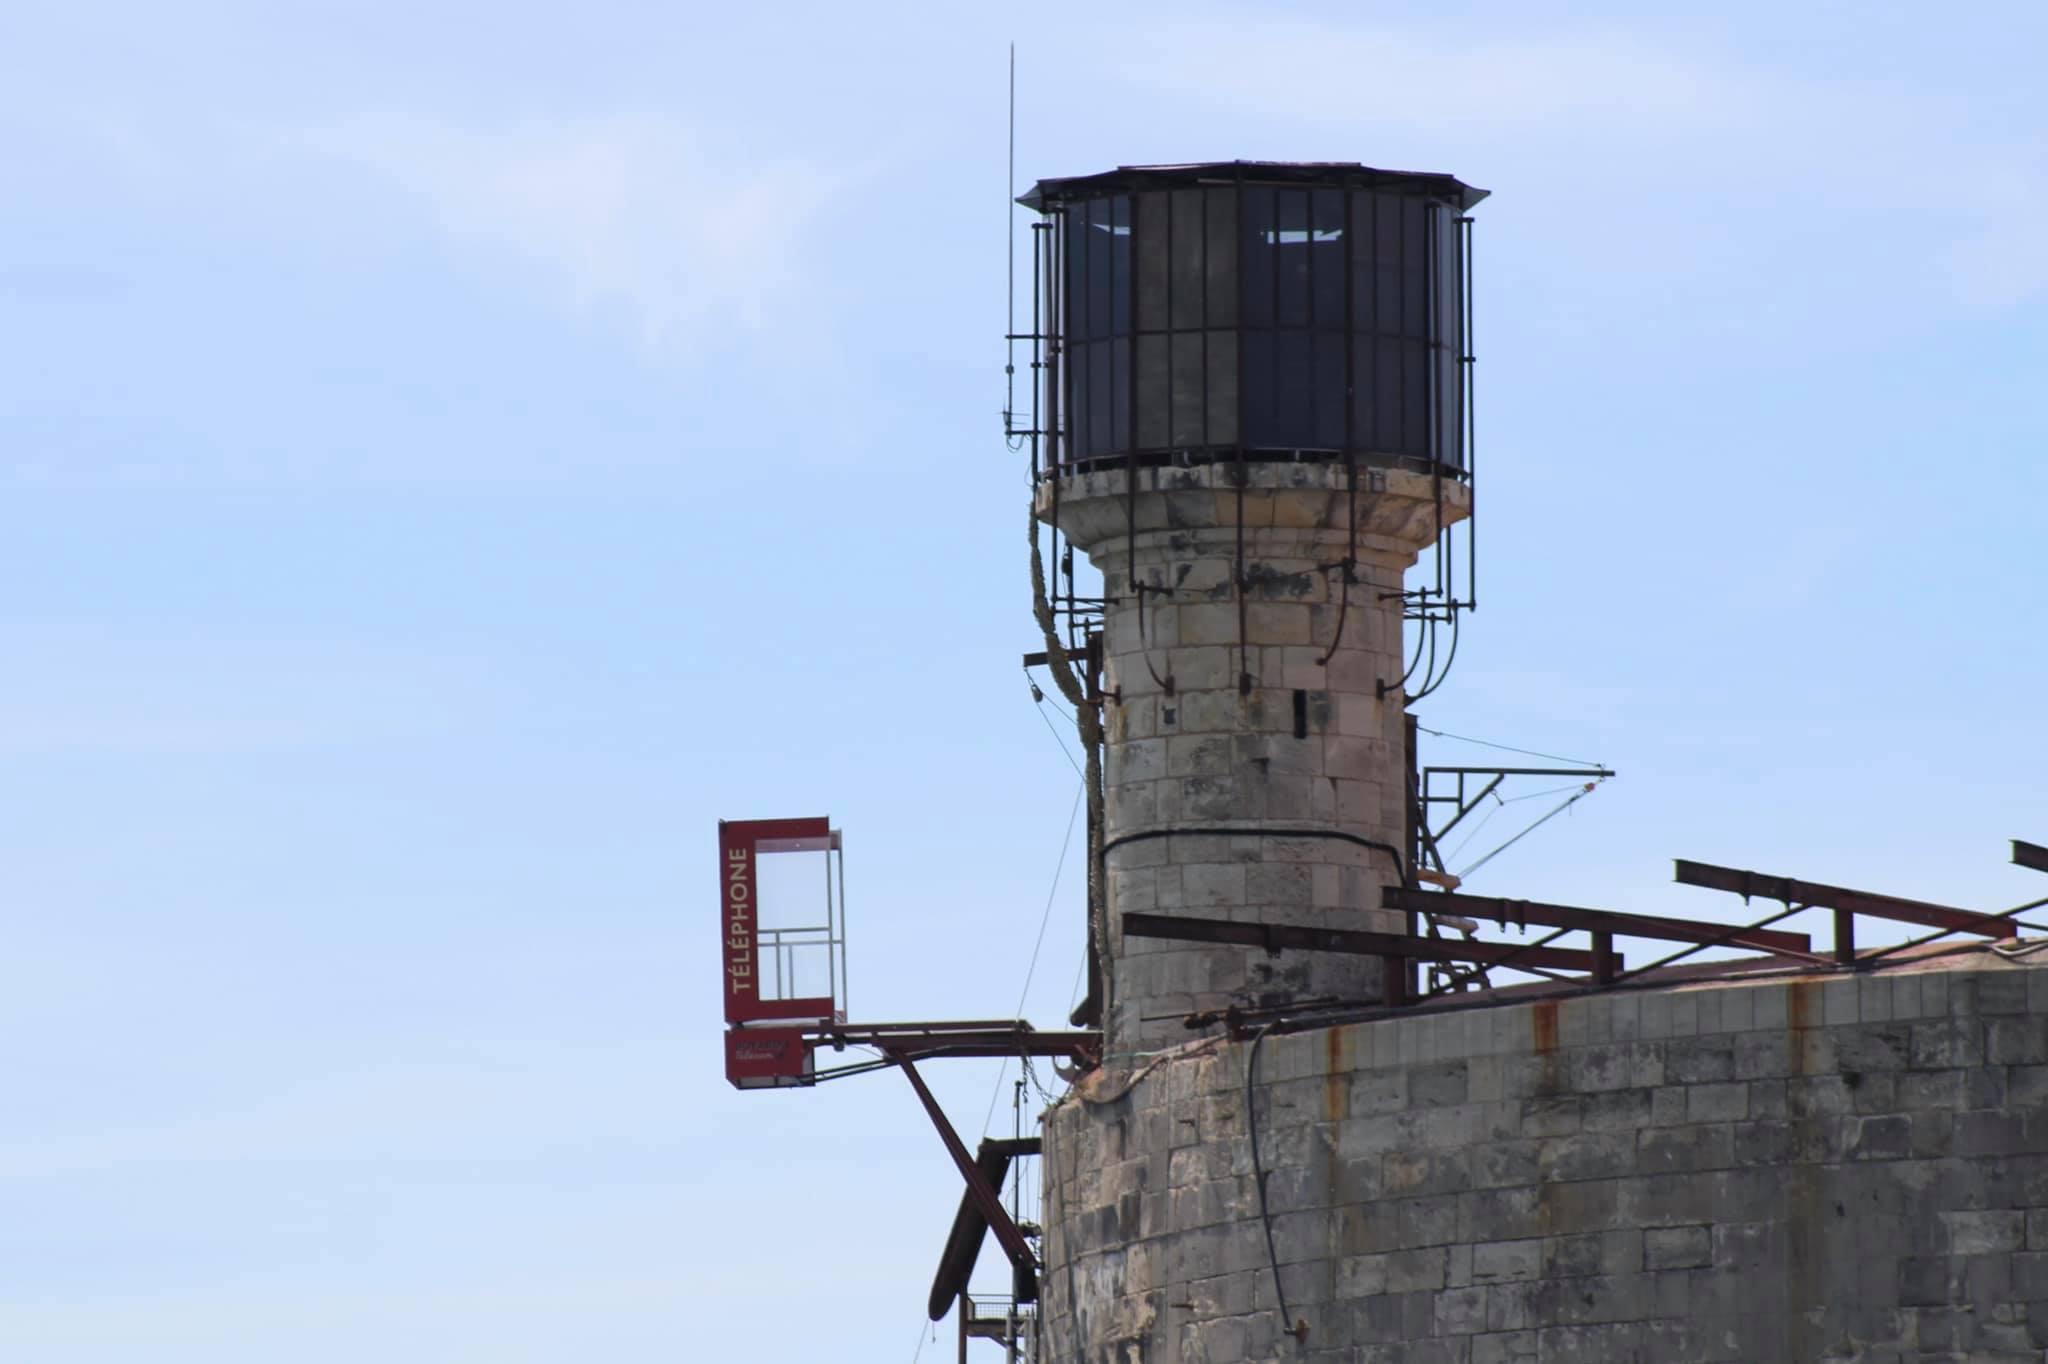 Photos des tournages Fort Boyard 2021 (production + candidats) - Page 6 18388110